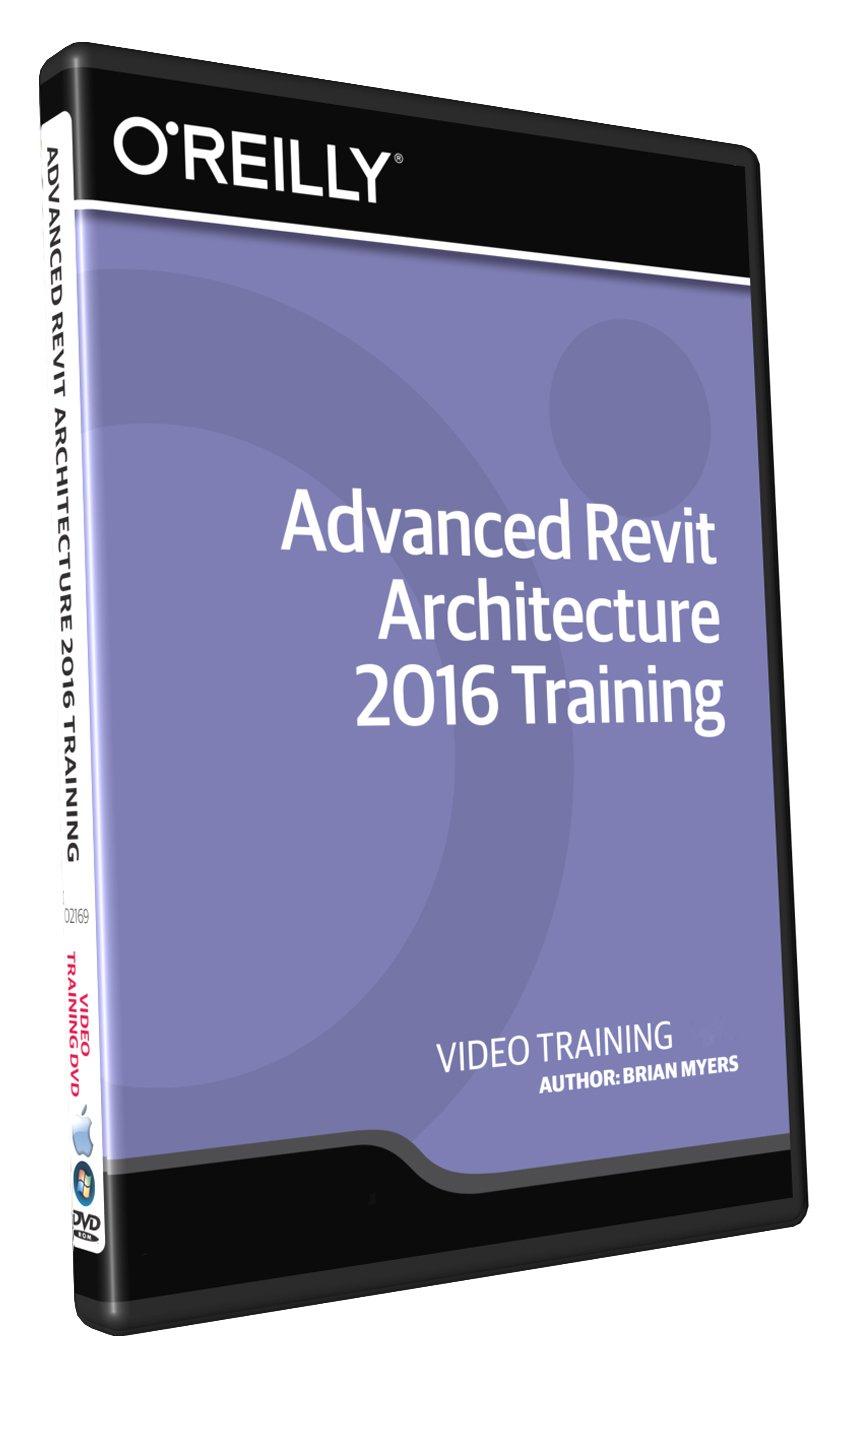 Exceptional Amazon.com: Advanced Revit Architecture 2016 Training   Training DVD:  Software